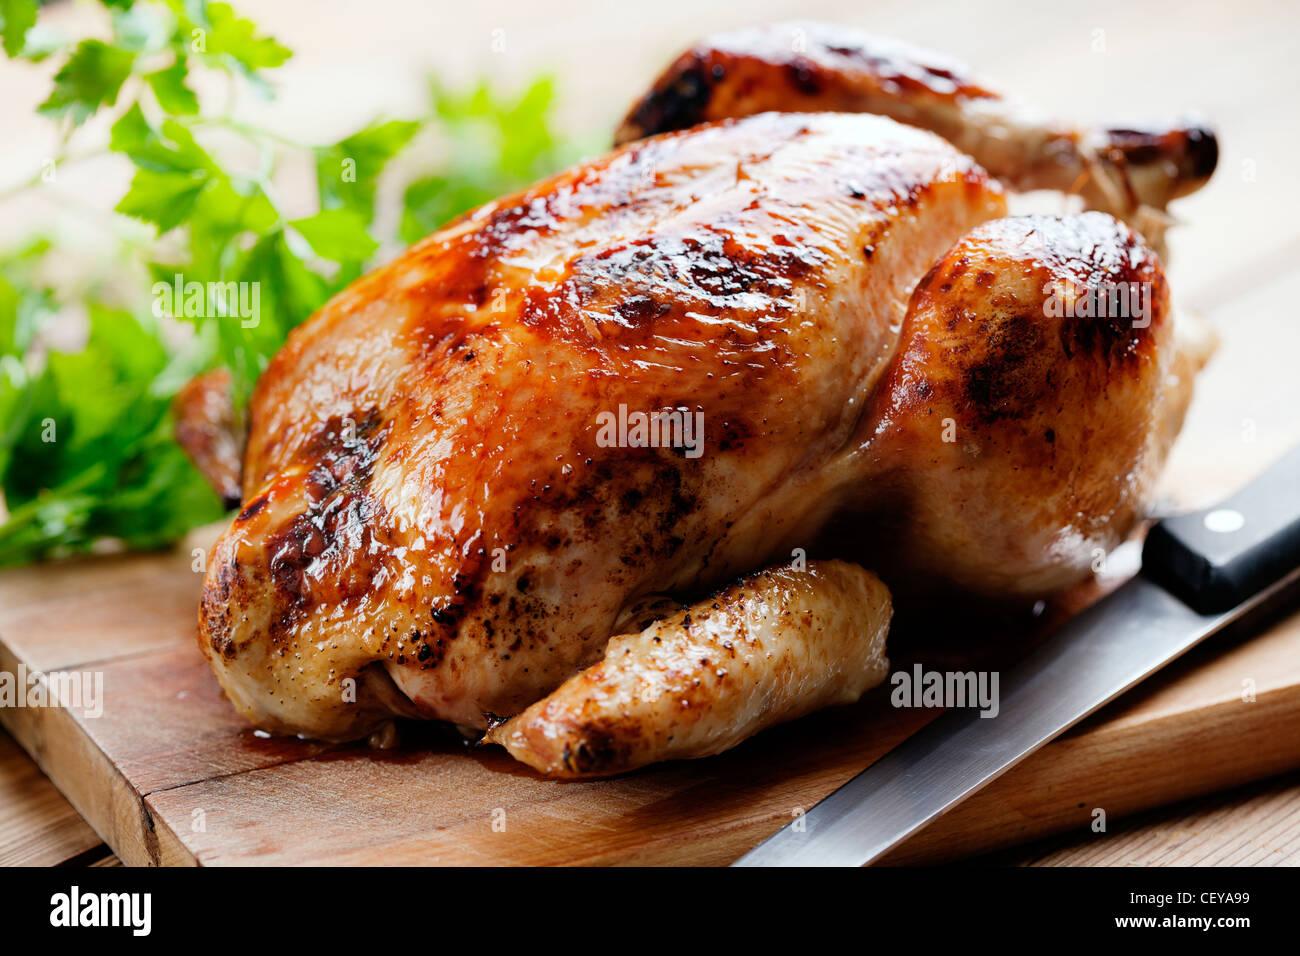 roast dinner - Stock Image